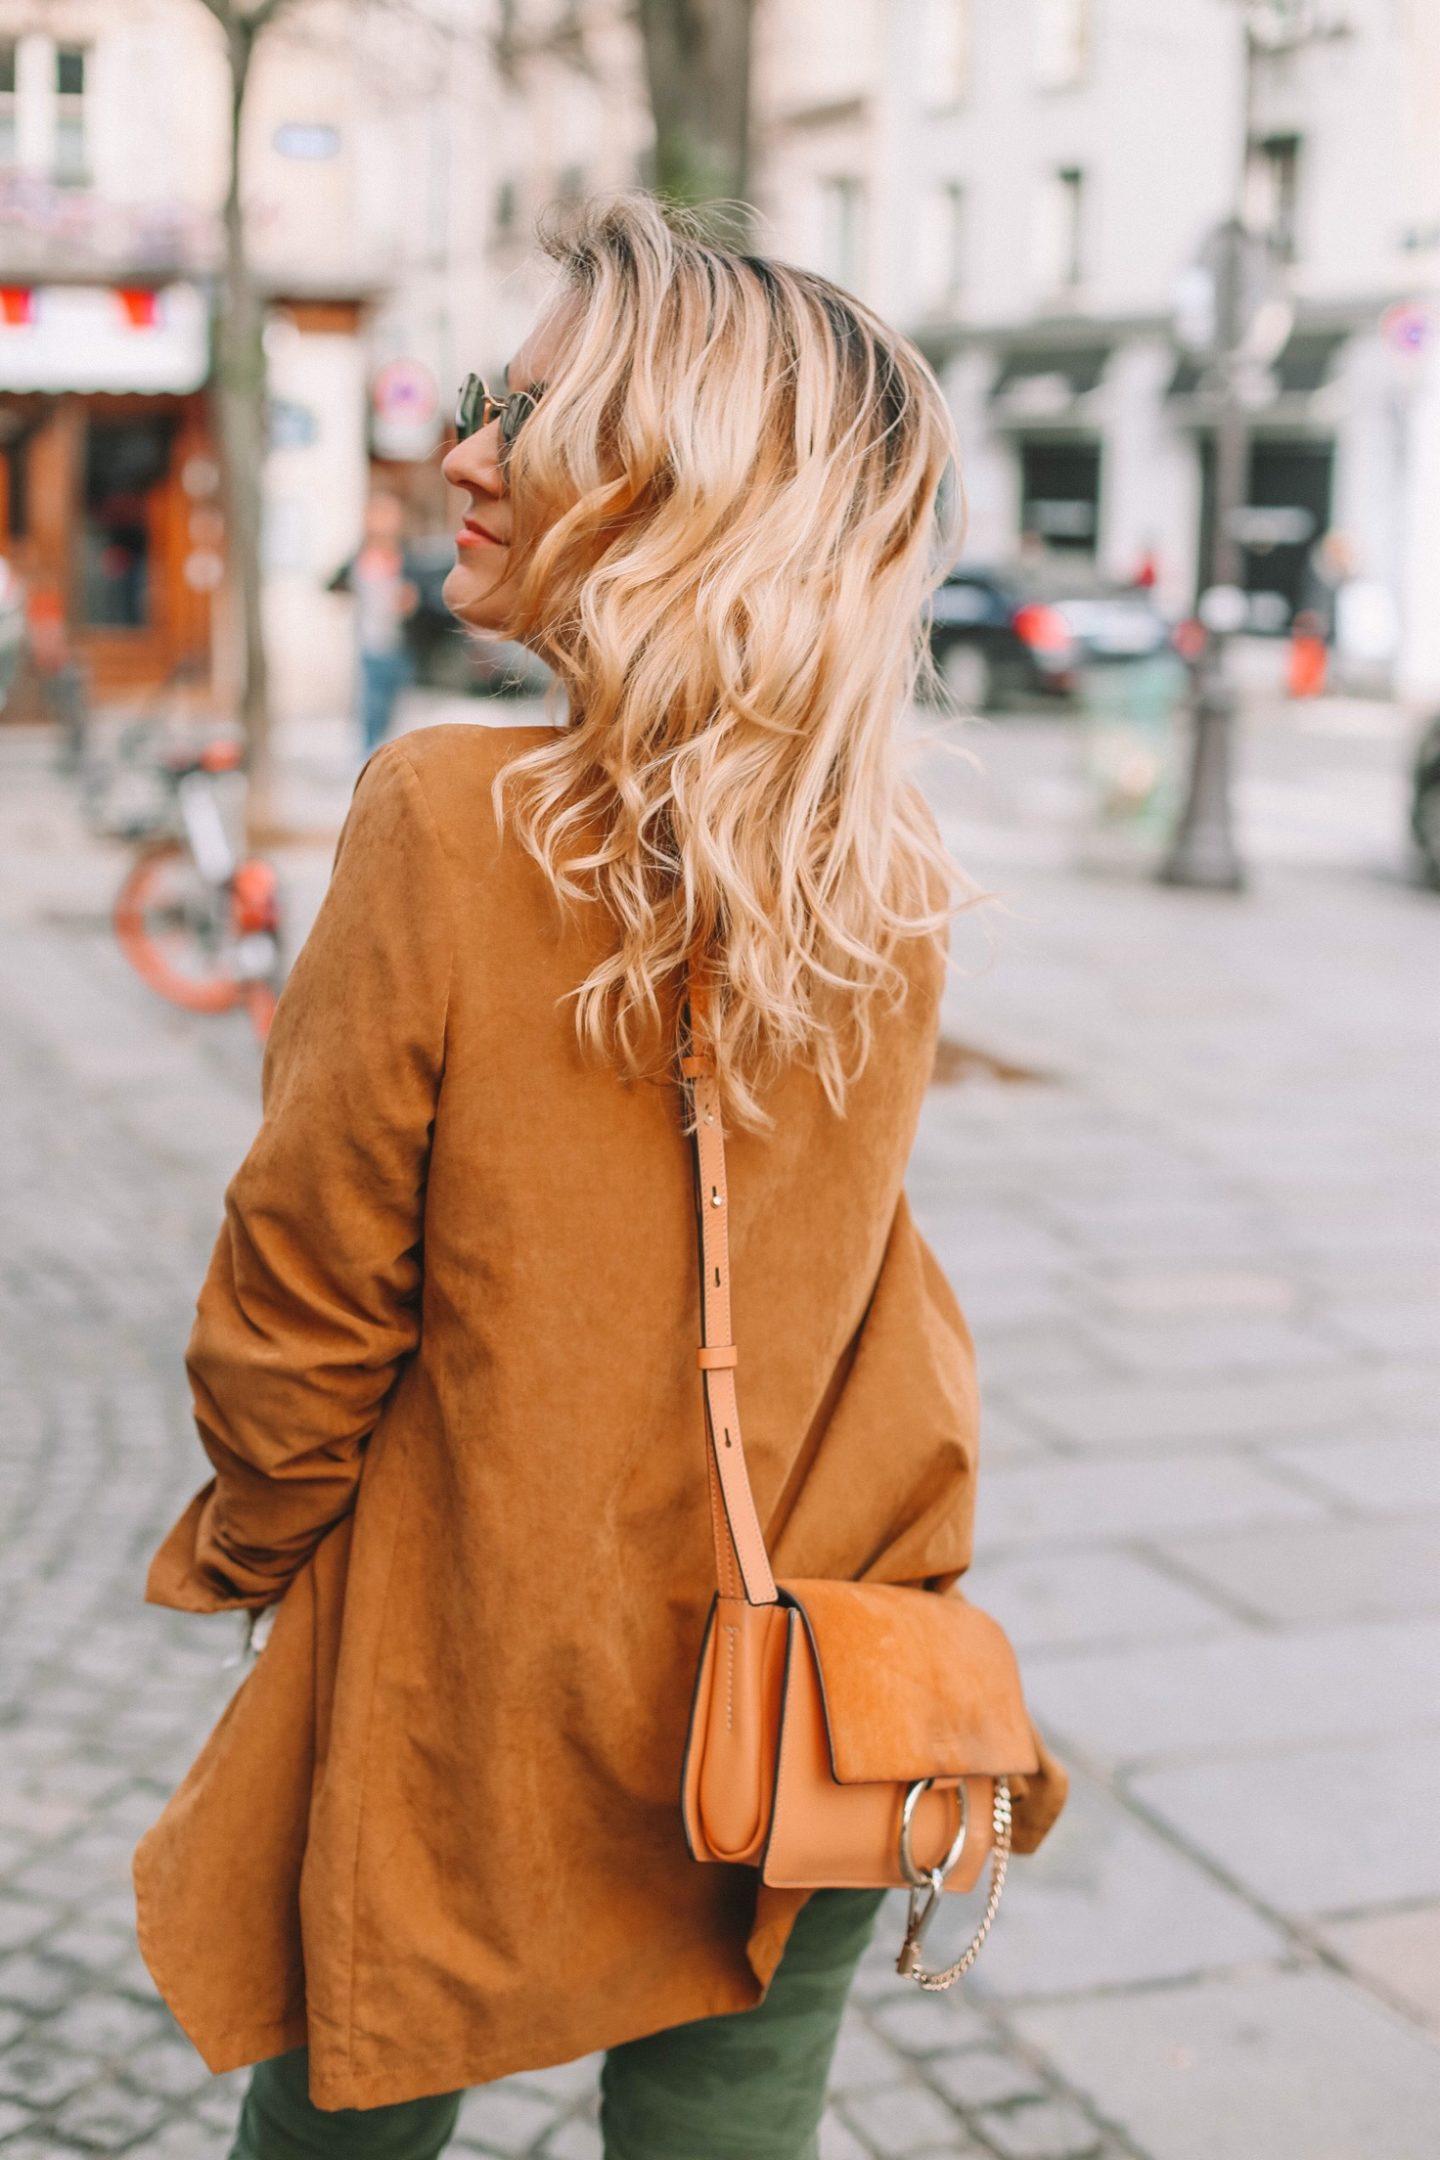 Balayage blond - Blondie Baby blog mode et voyages